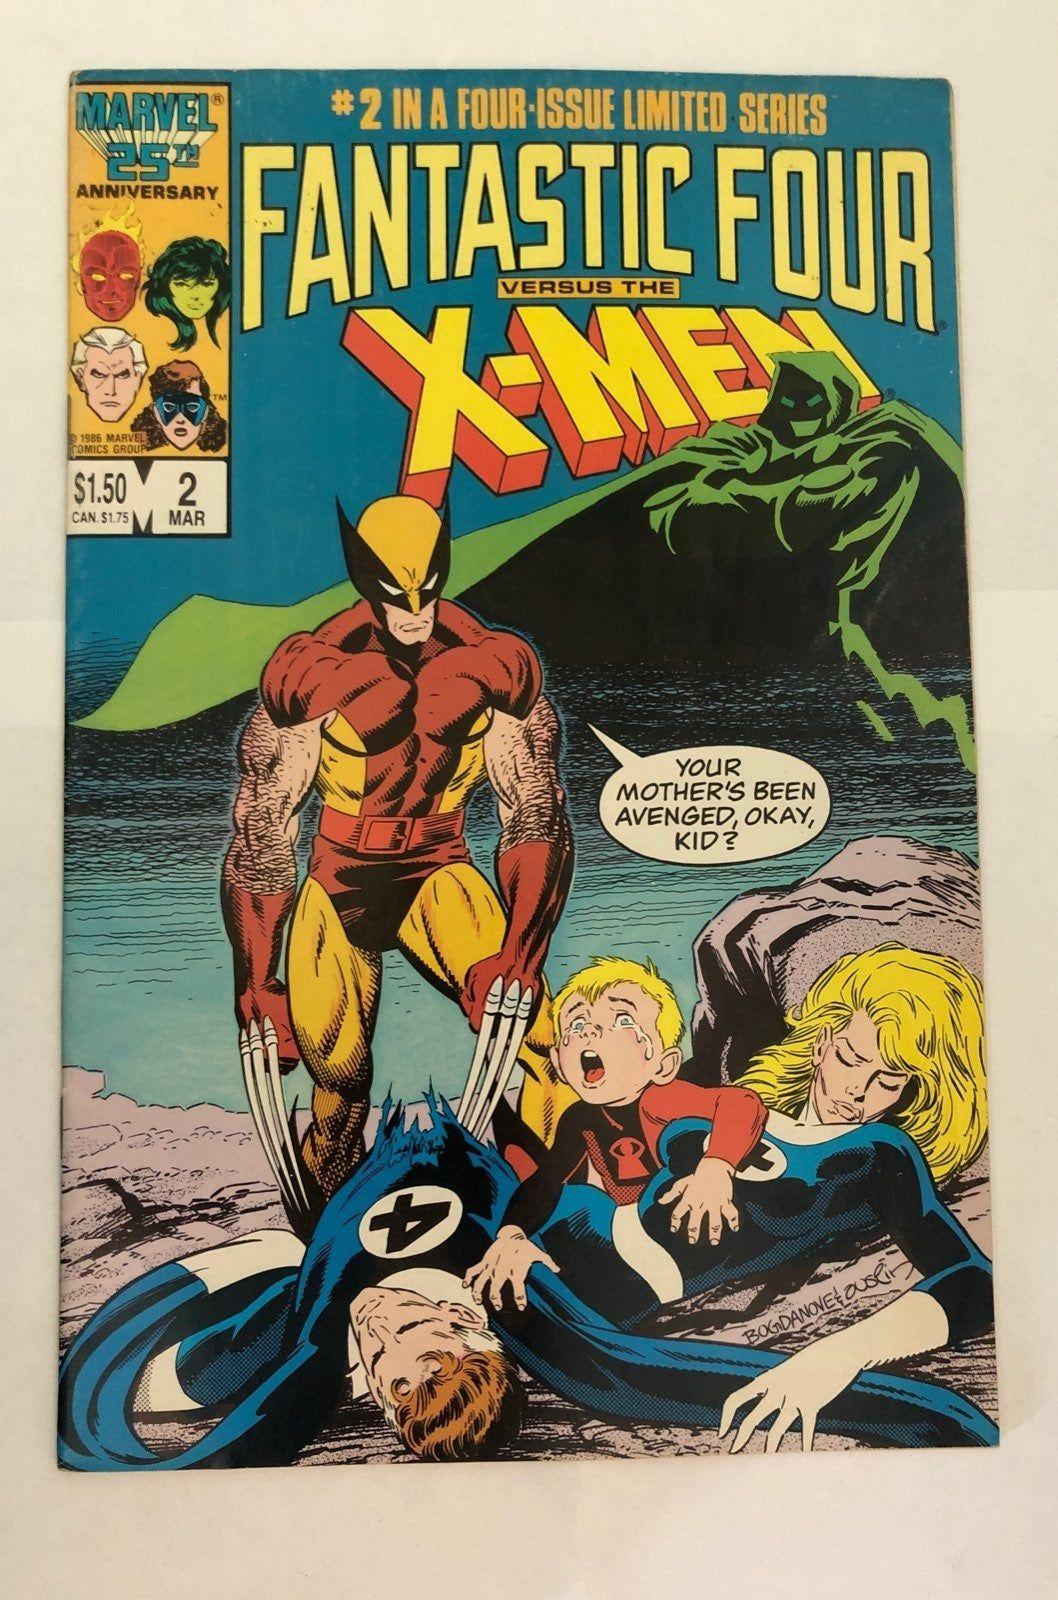 Fantastic Four Vs The X Men 2 Mercari In 2020 Classic Comic Books Fantastic Four Comics Classic Comics